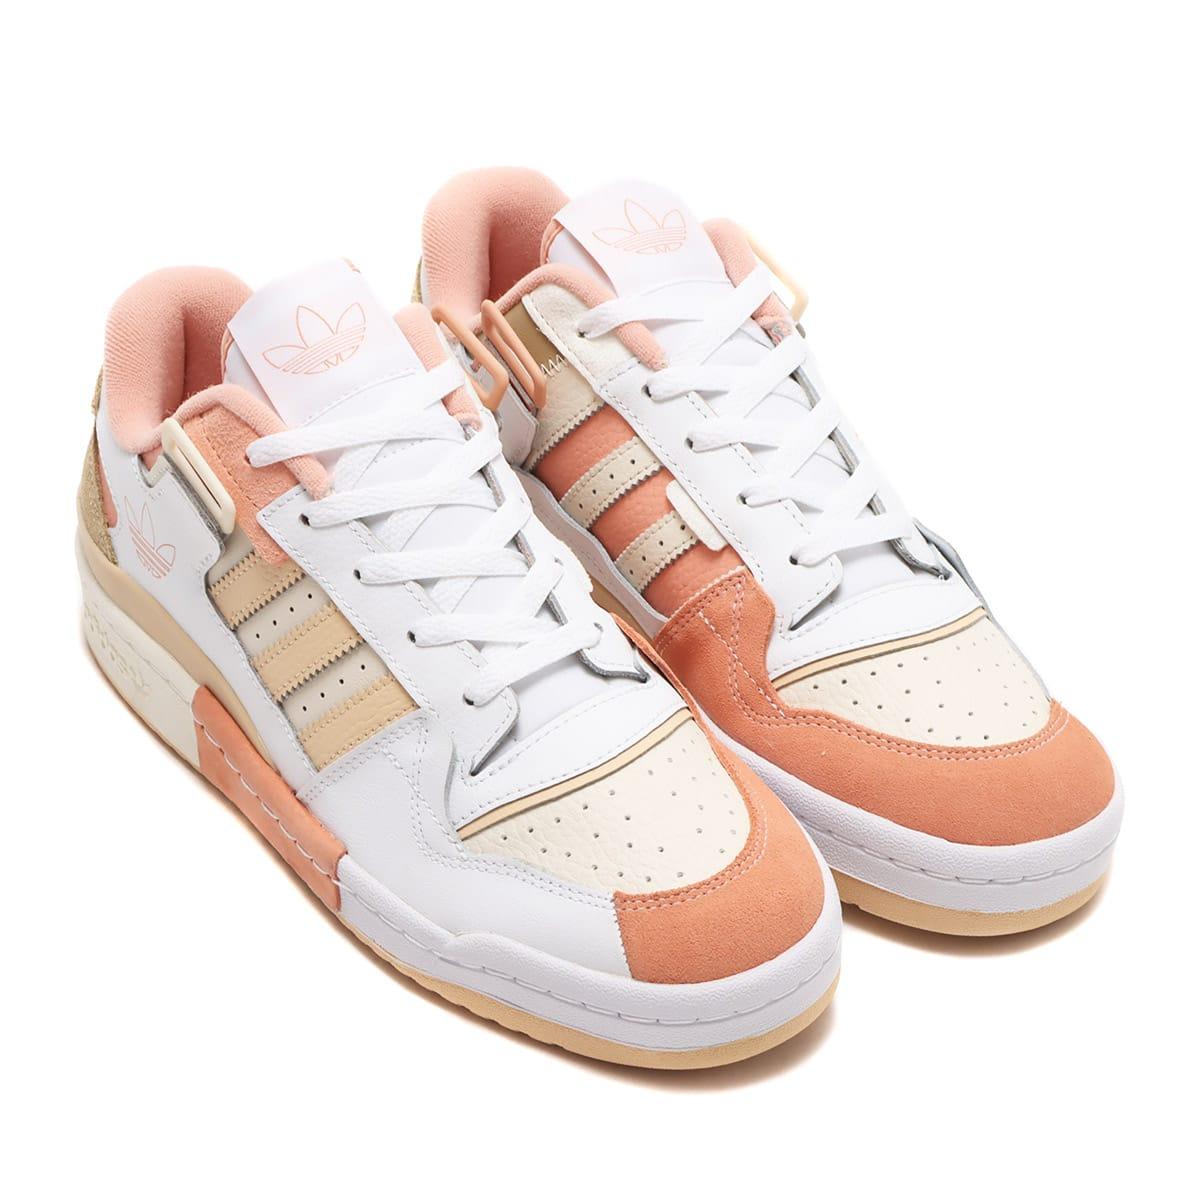 adidas FORUM EXHIBIT LOW FOOTWEAR WHITE/CREAM WHITE/HELLOW UMBER 21FW-I_photo_large